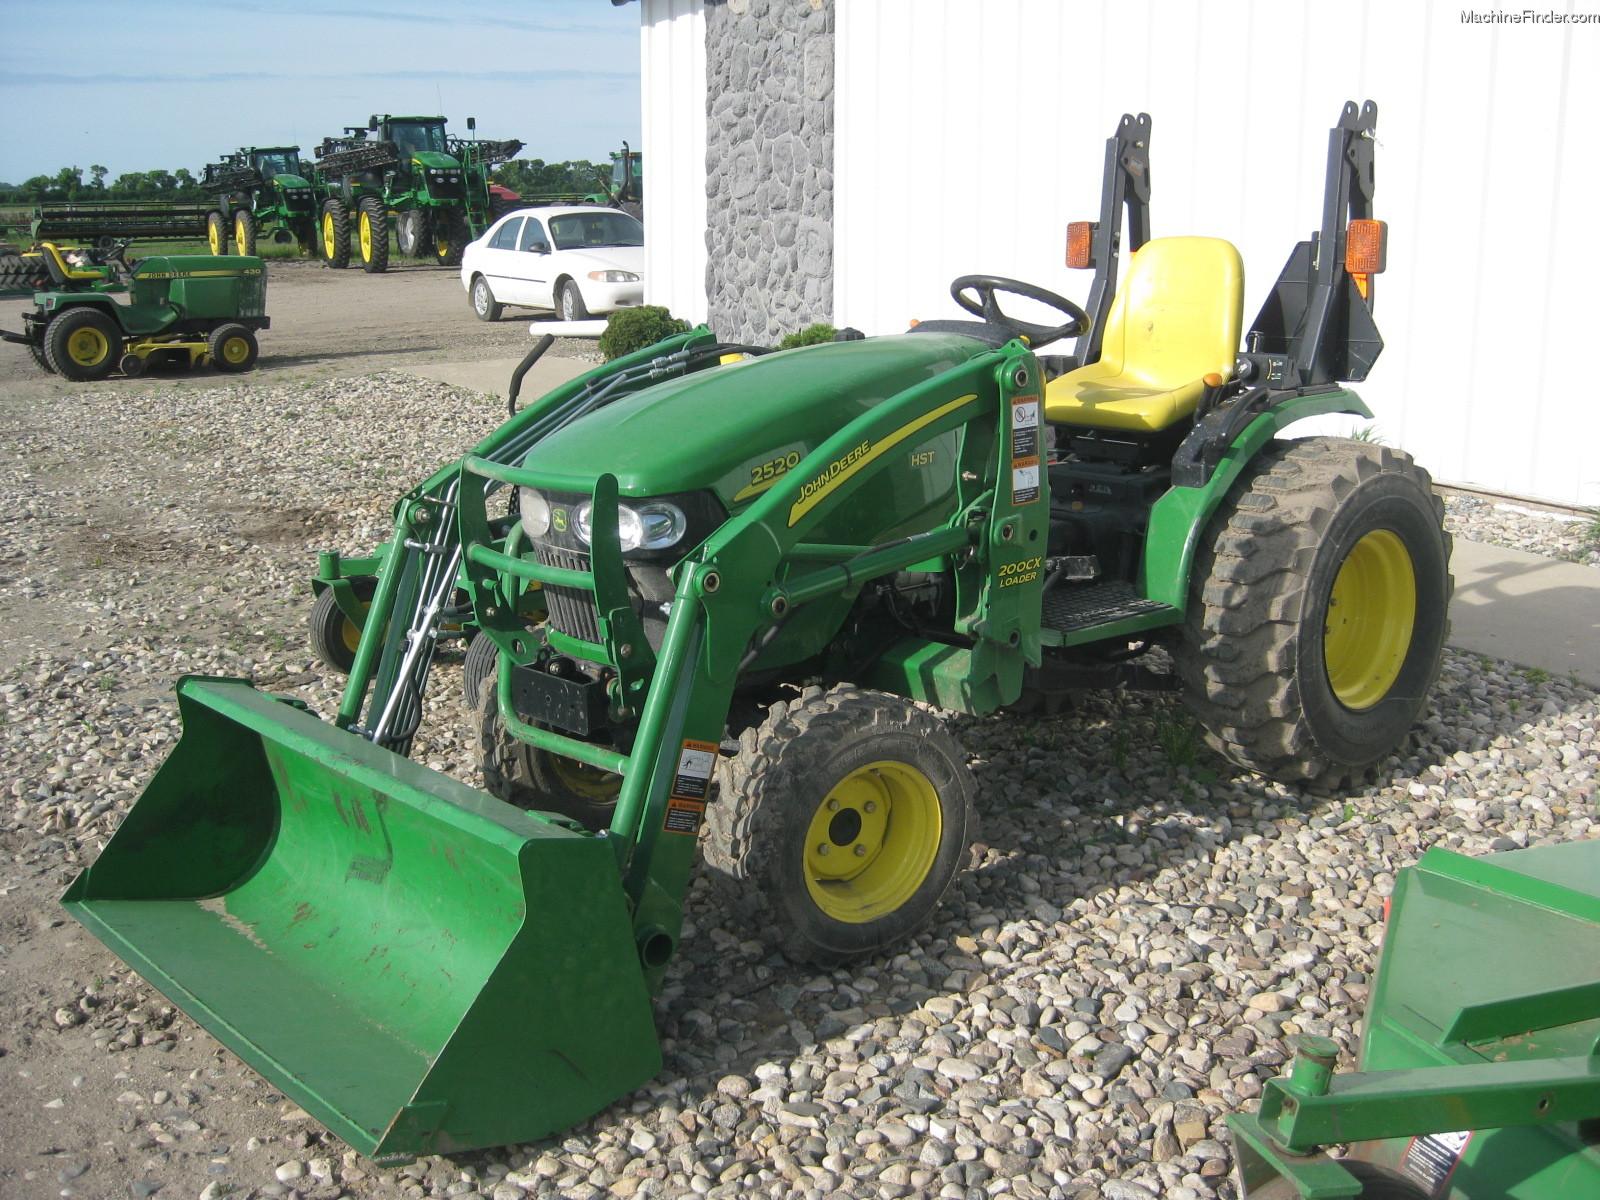 2008 John Deere 2520 Tractors - Compact (1-40hp.) - John ...